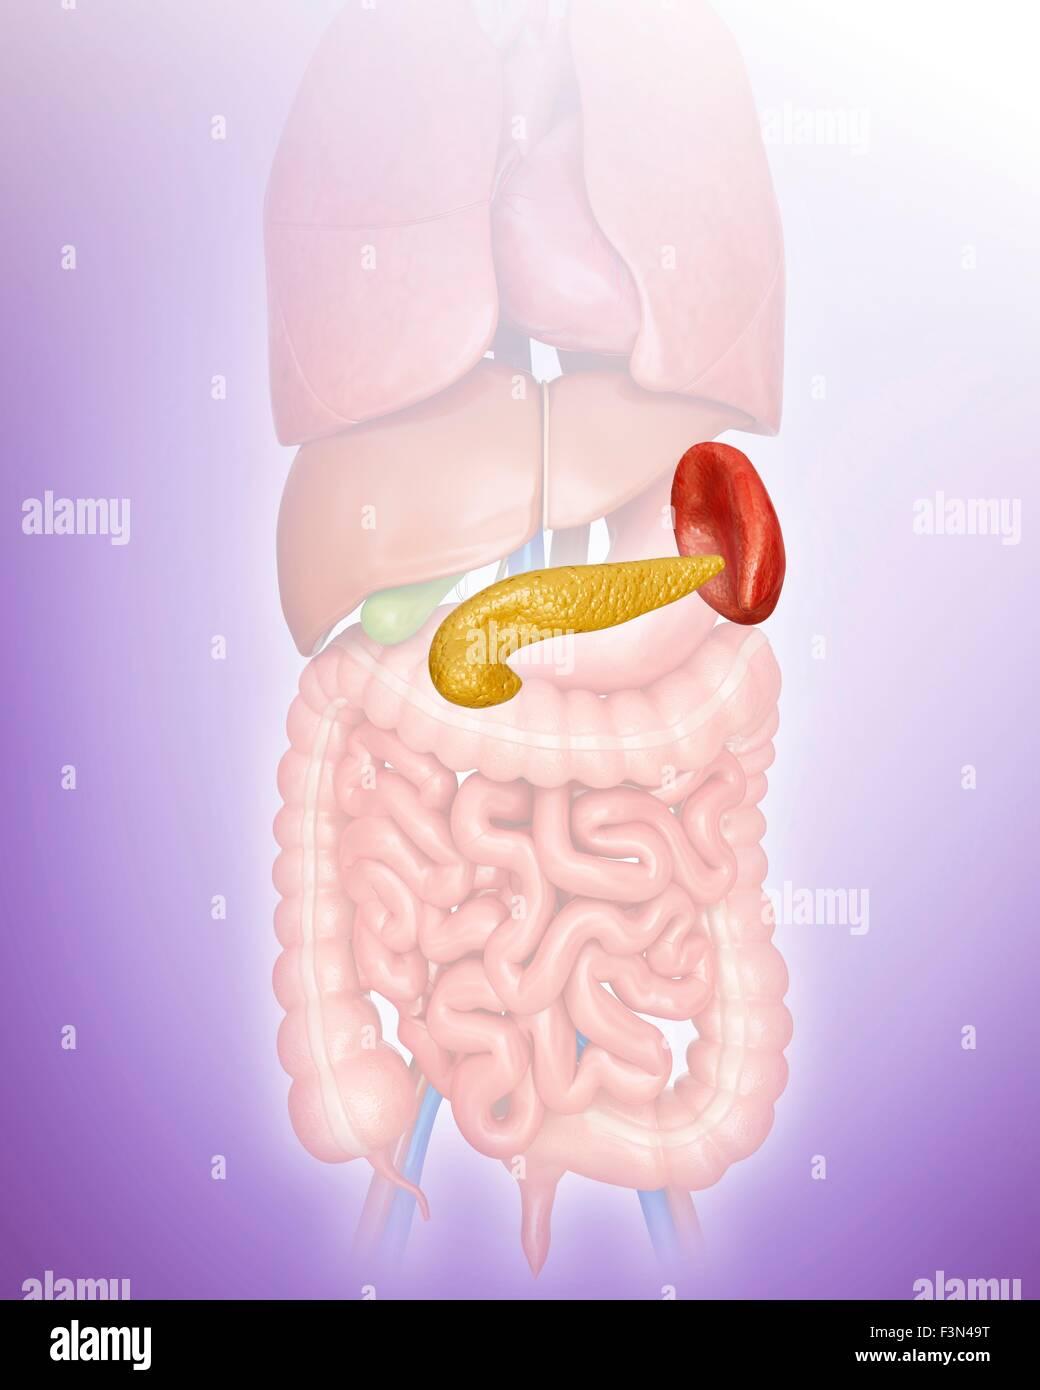 Pancreas And Spleen Illustration Stock Photo 88360212 Alamy